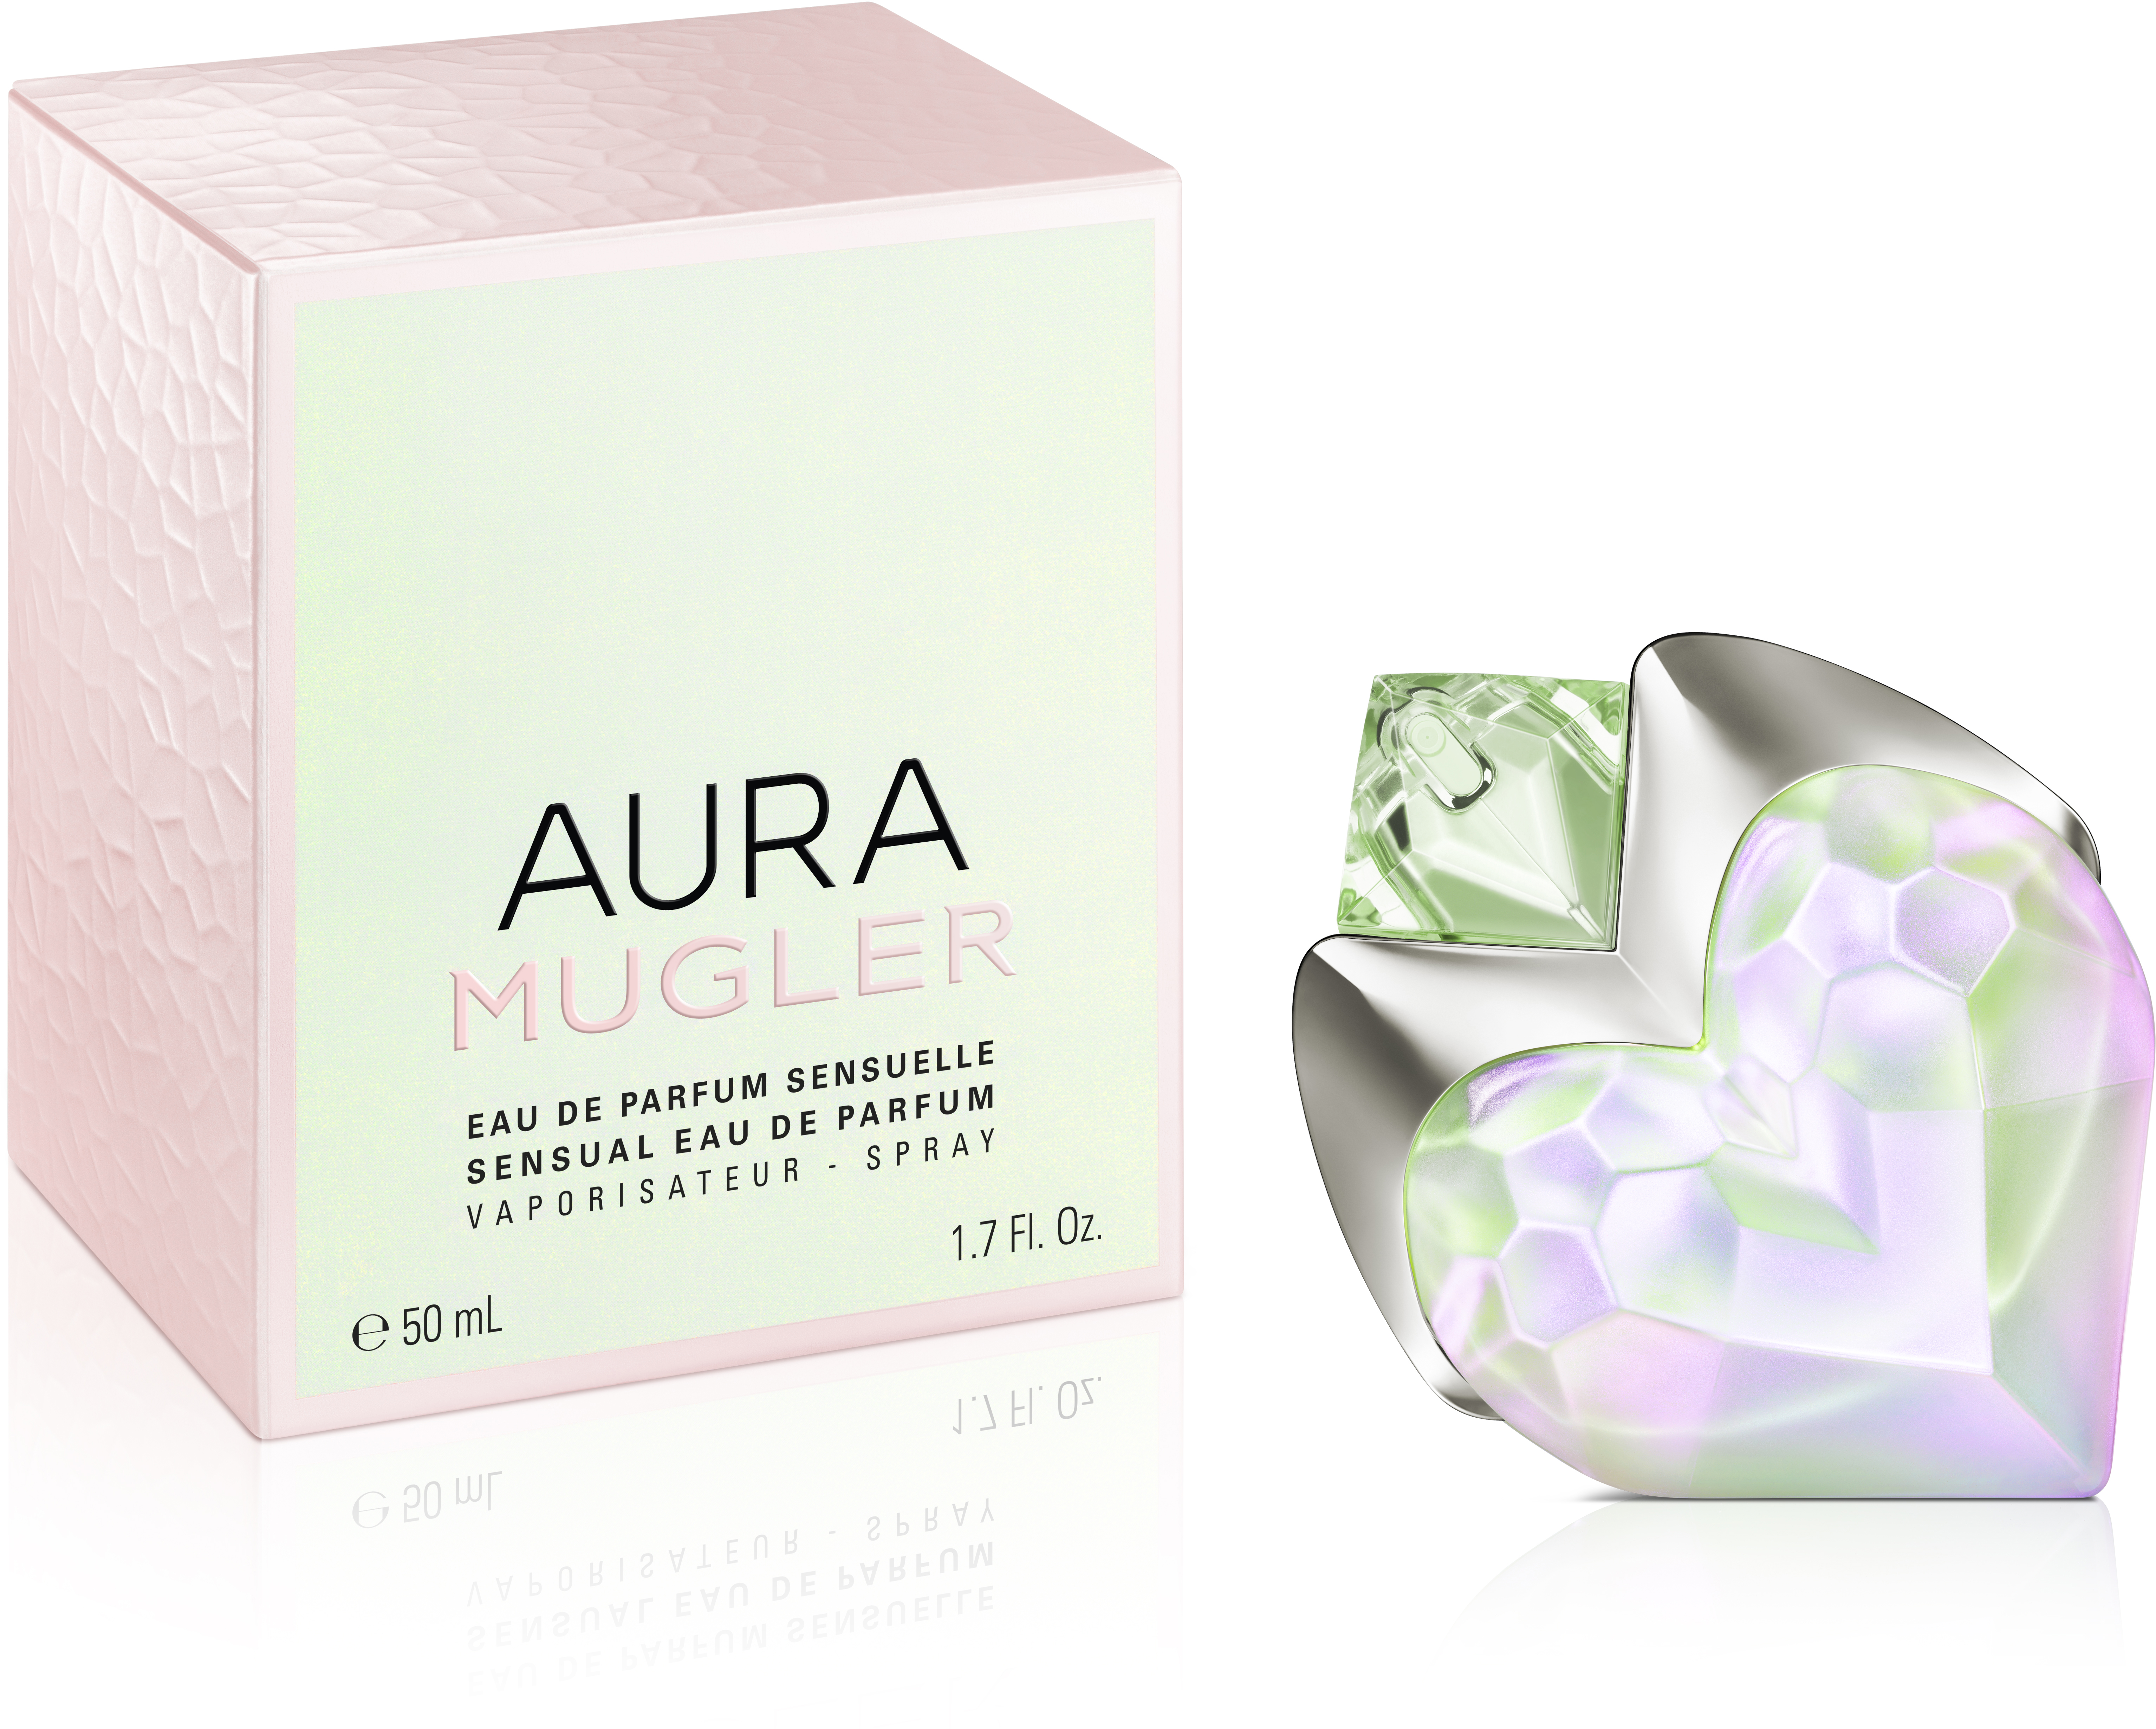 MUGLER Aura Eau de Toilette Spray 50ml Parfym